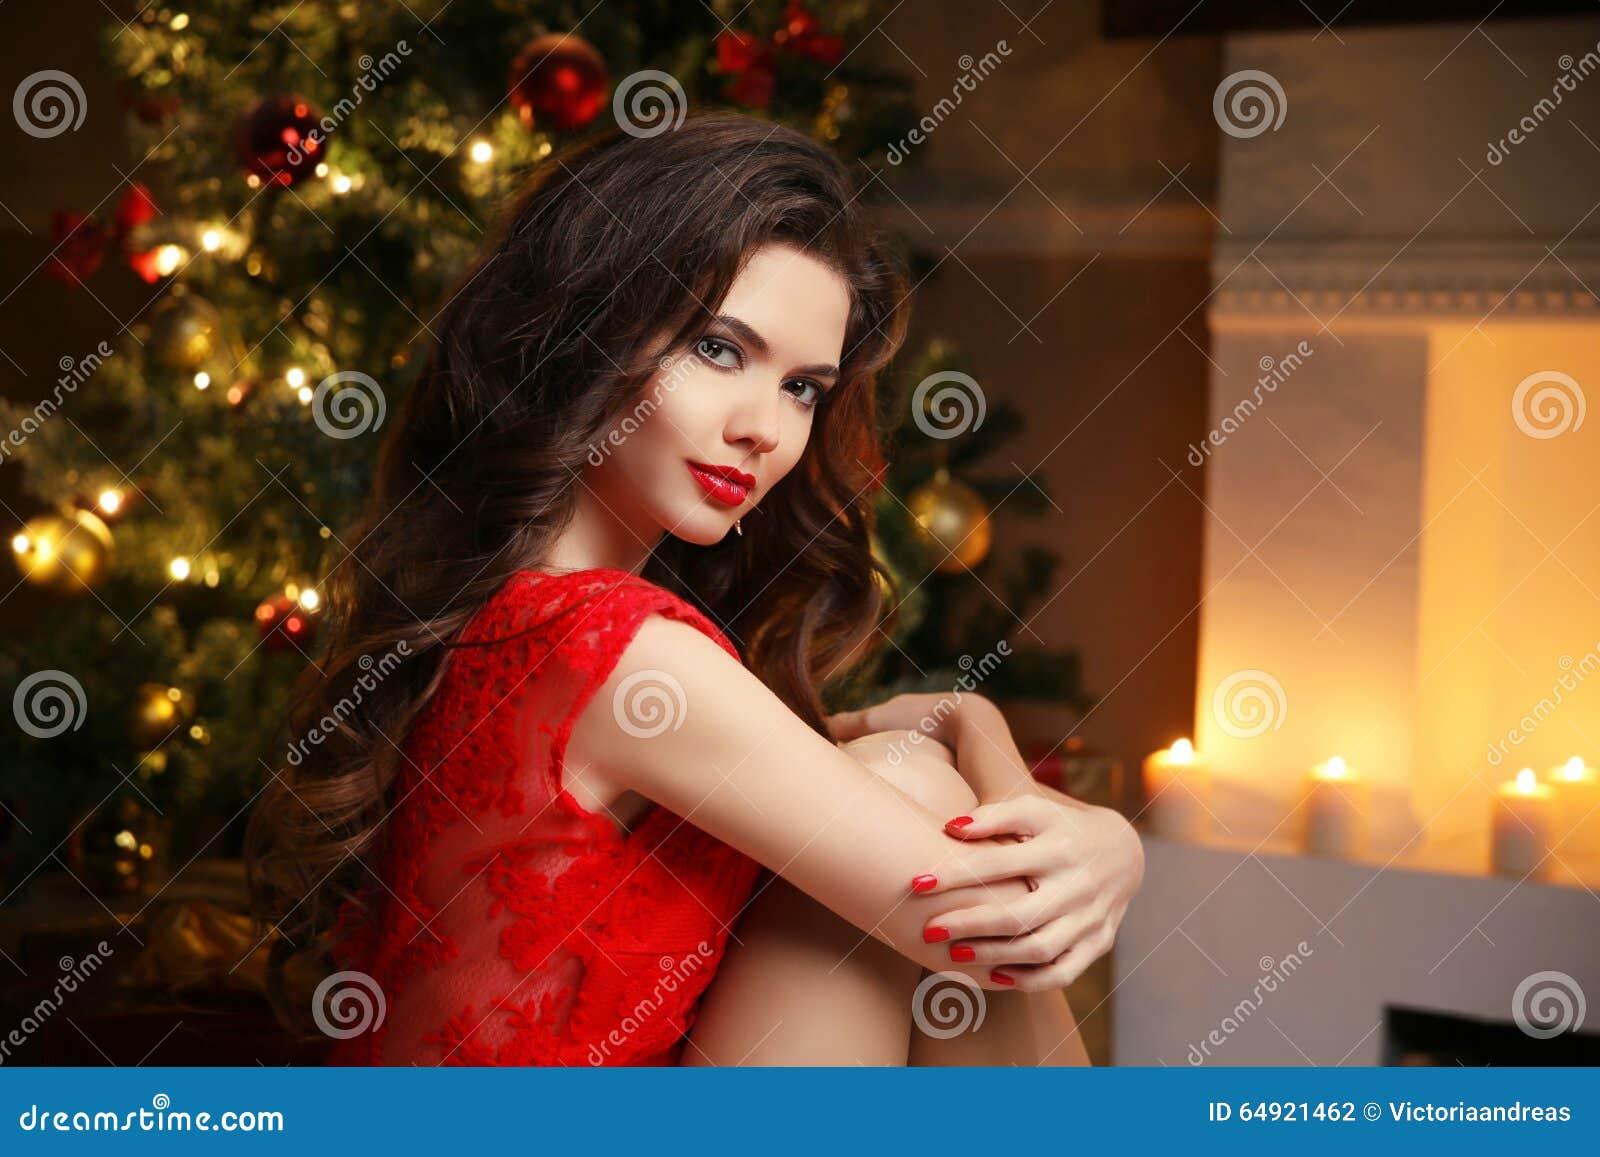 Christmas Hairstyles For Black Girls.Christmas Santa Beautiful Smiling Woman Model Makeup